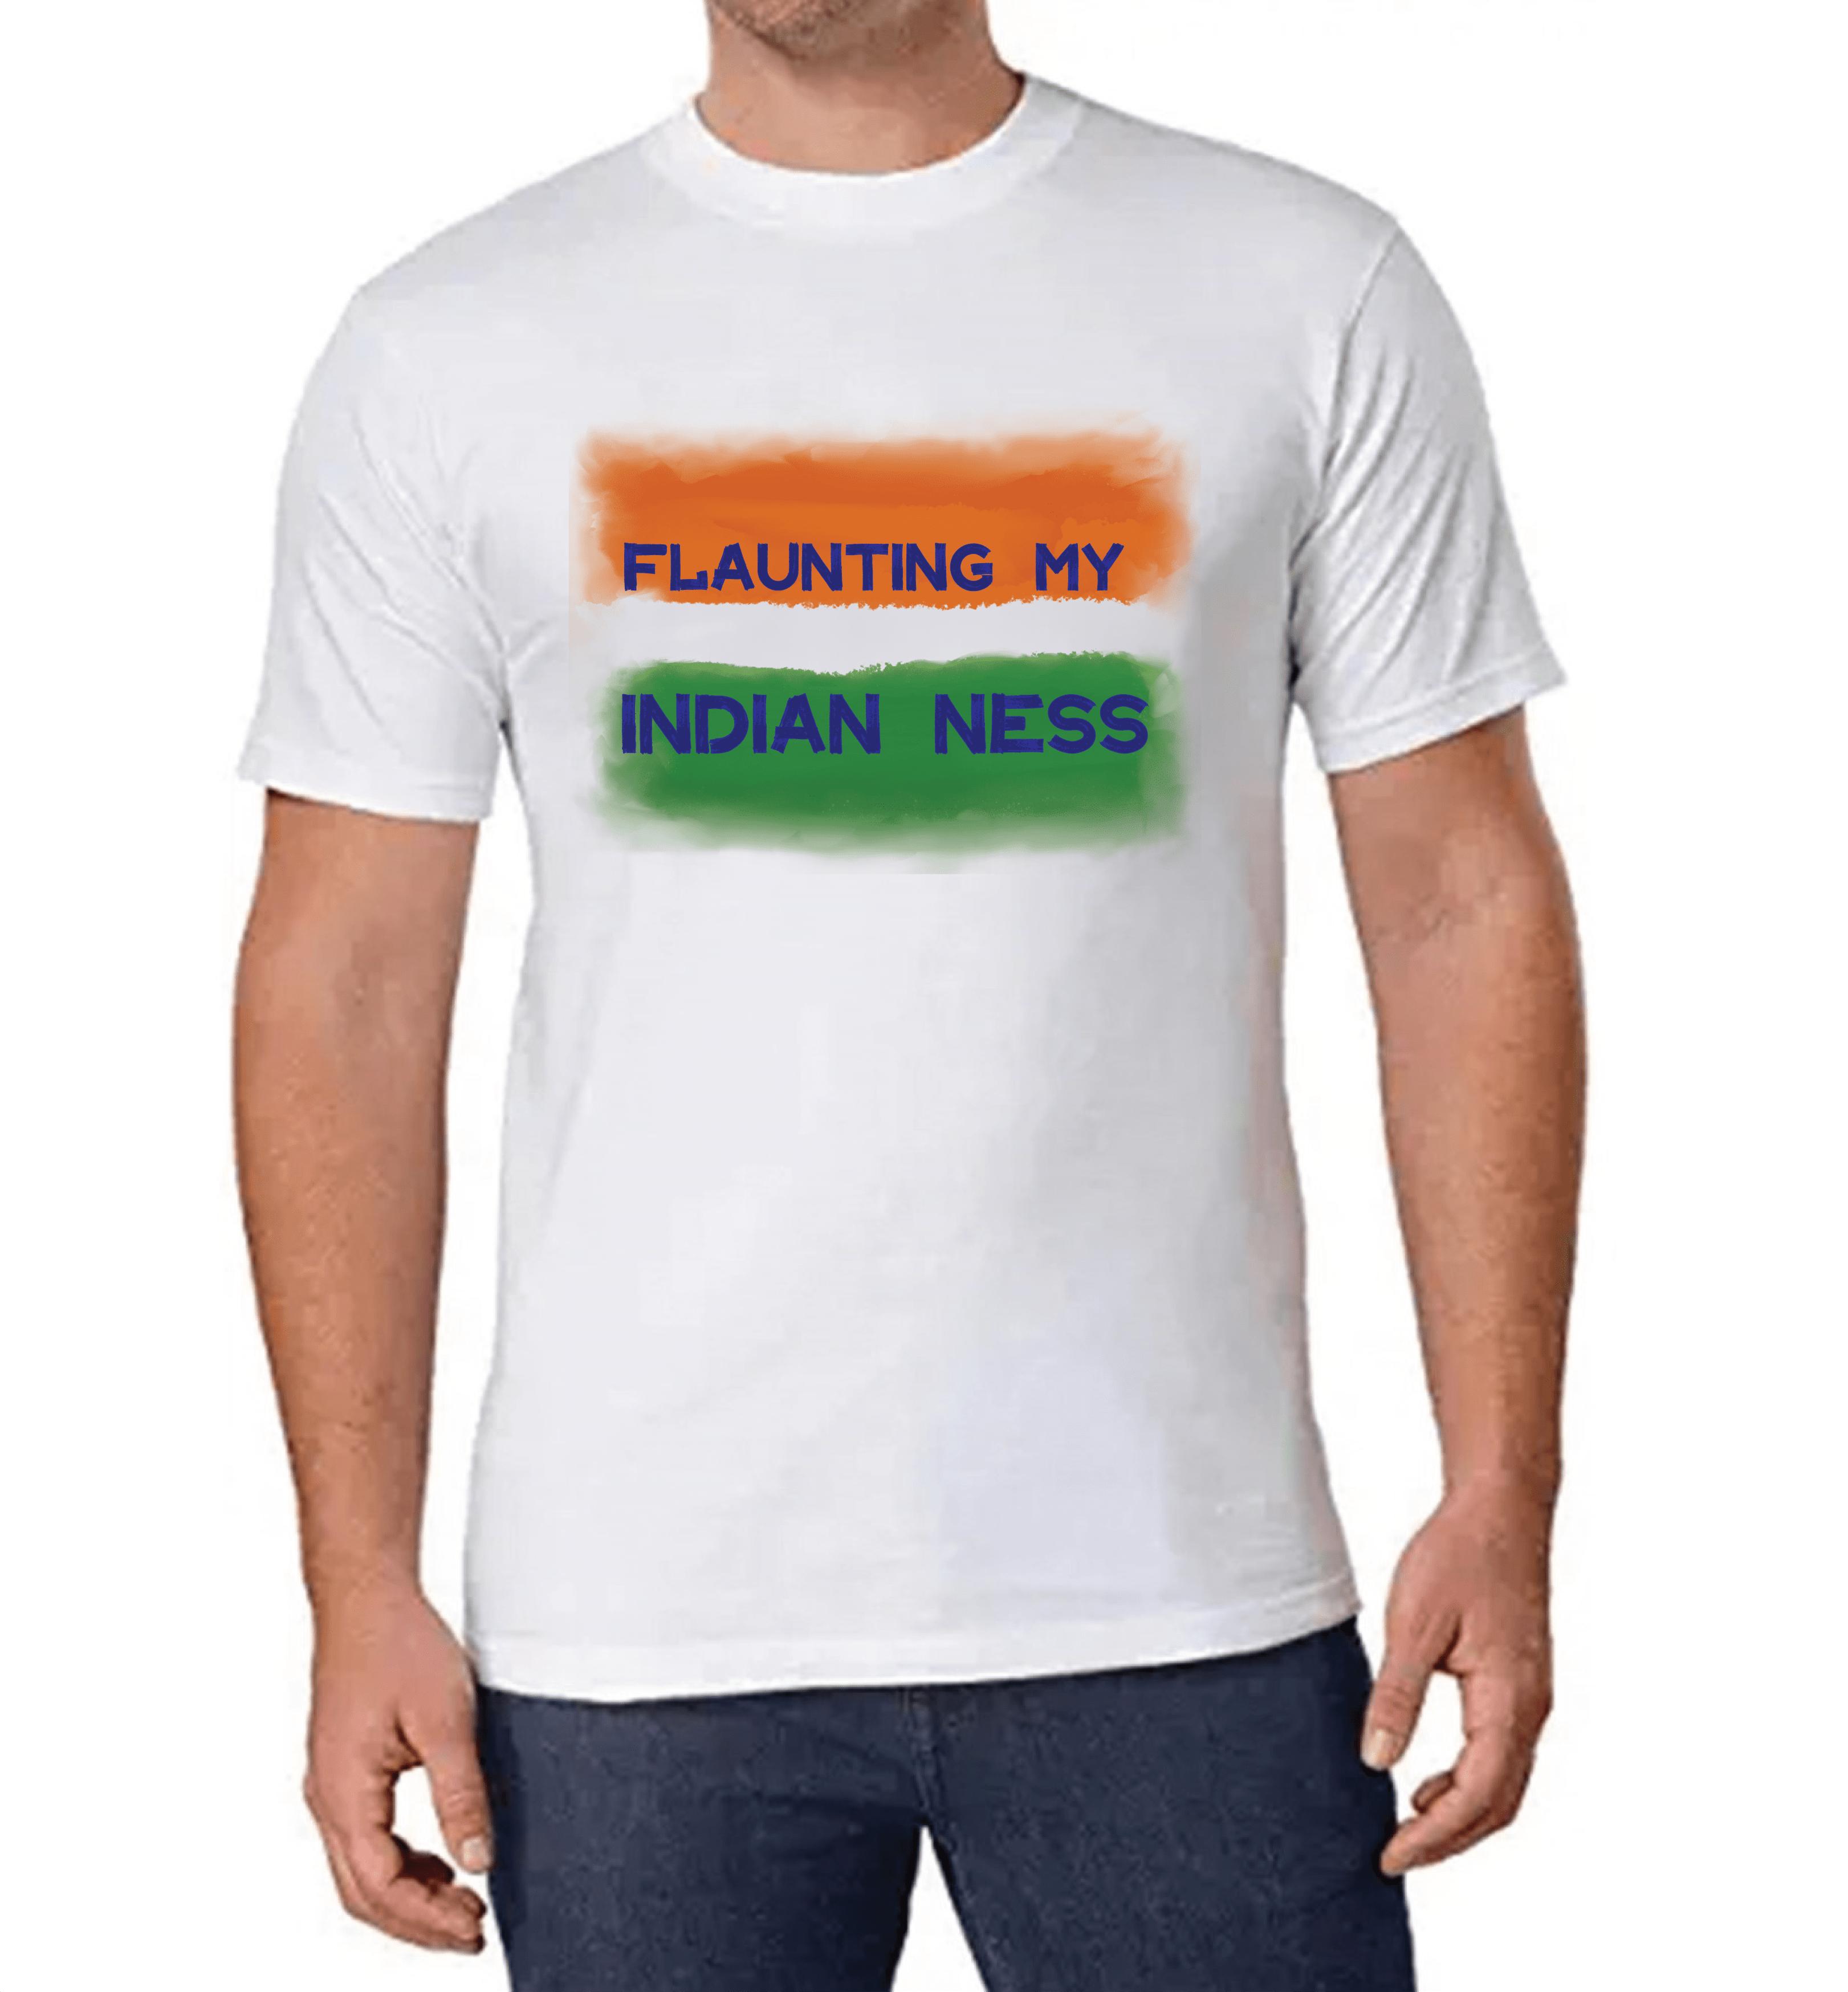 Flaunting My INDIAN NESS T-shirt for Men Slider Thumbnail 1/2